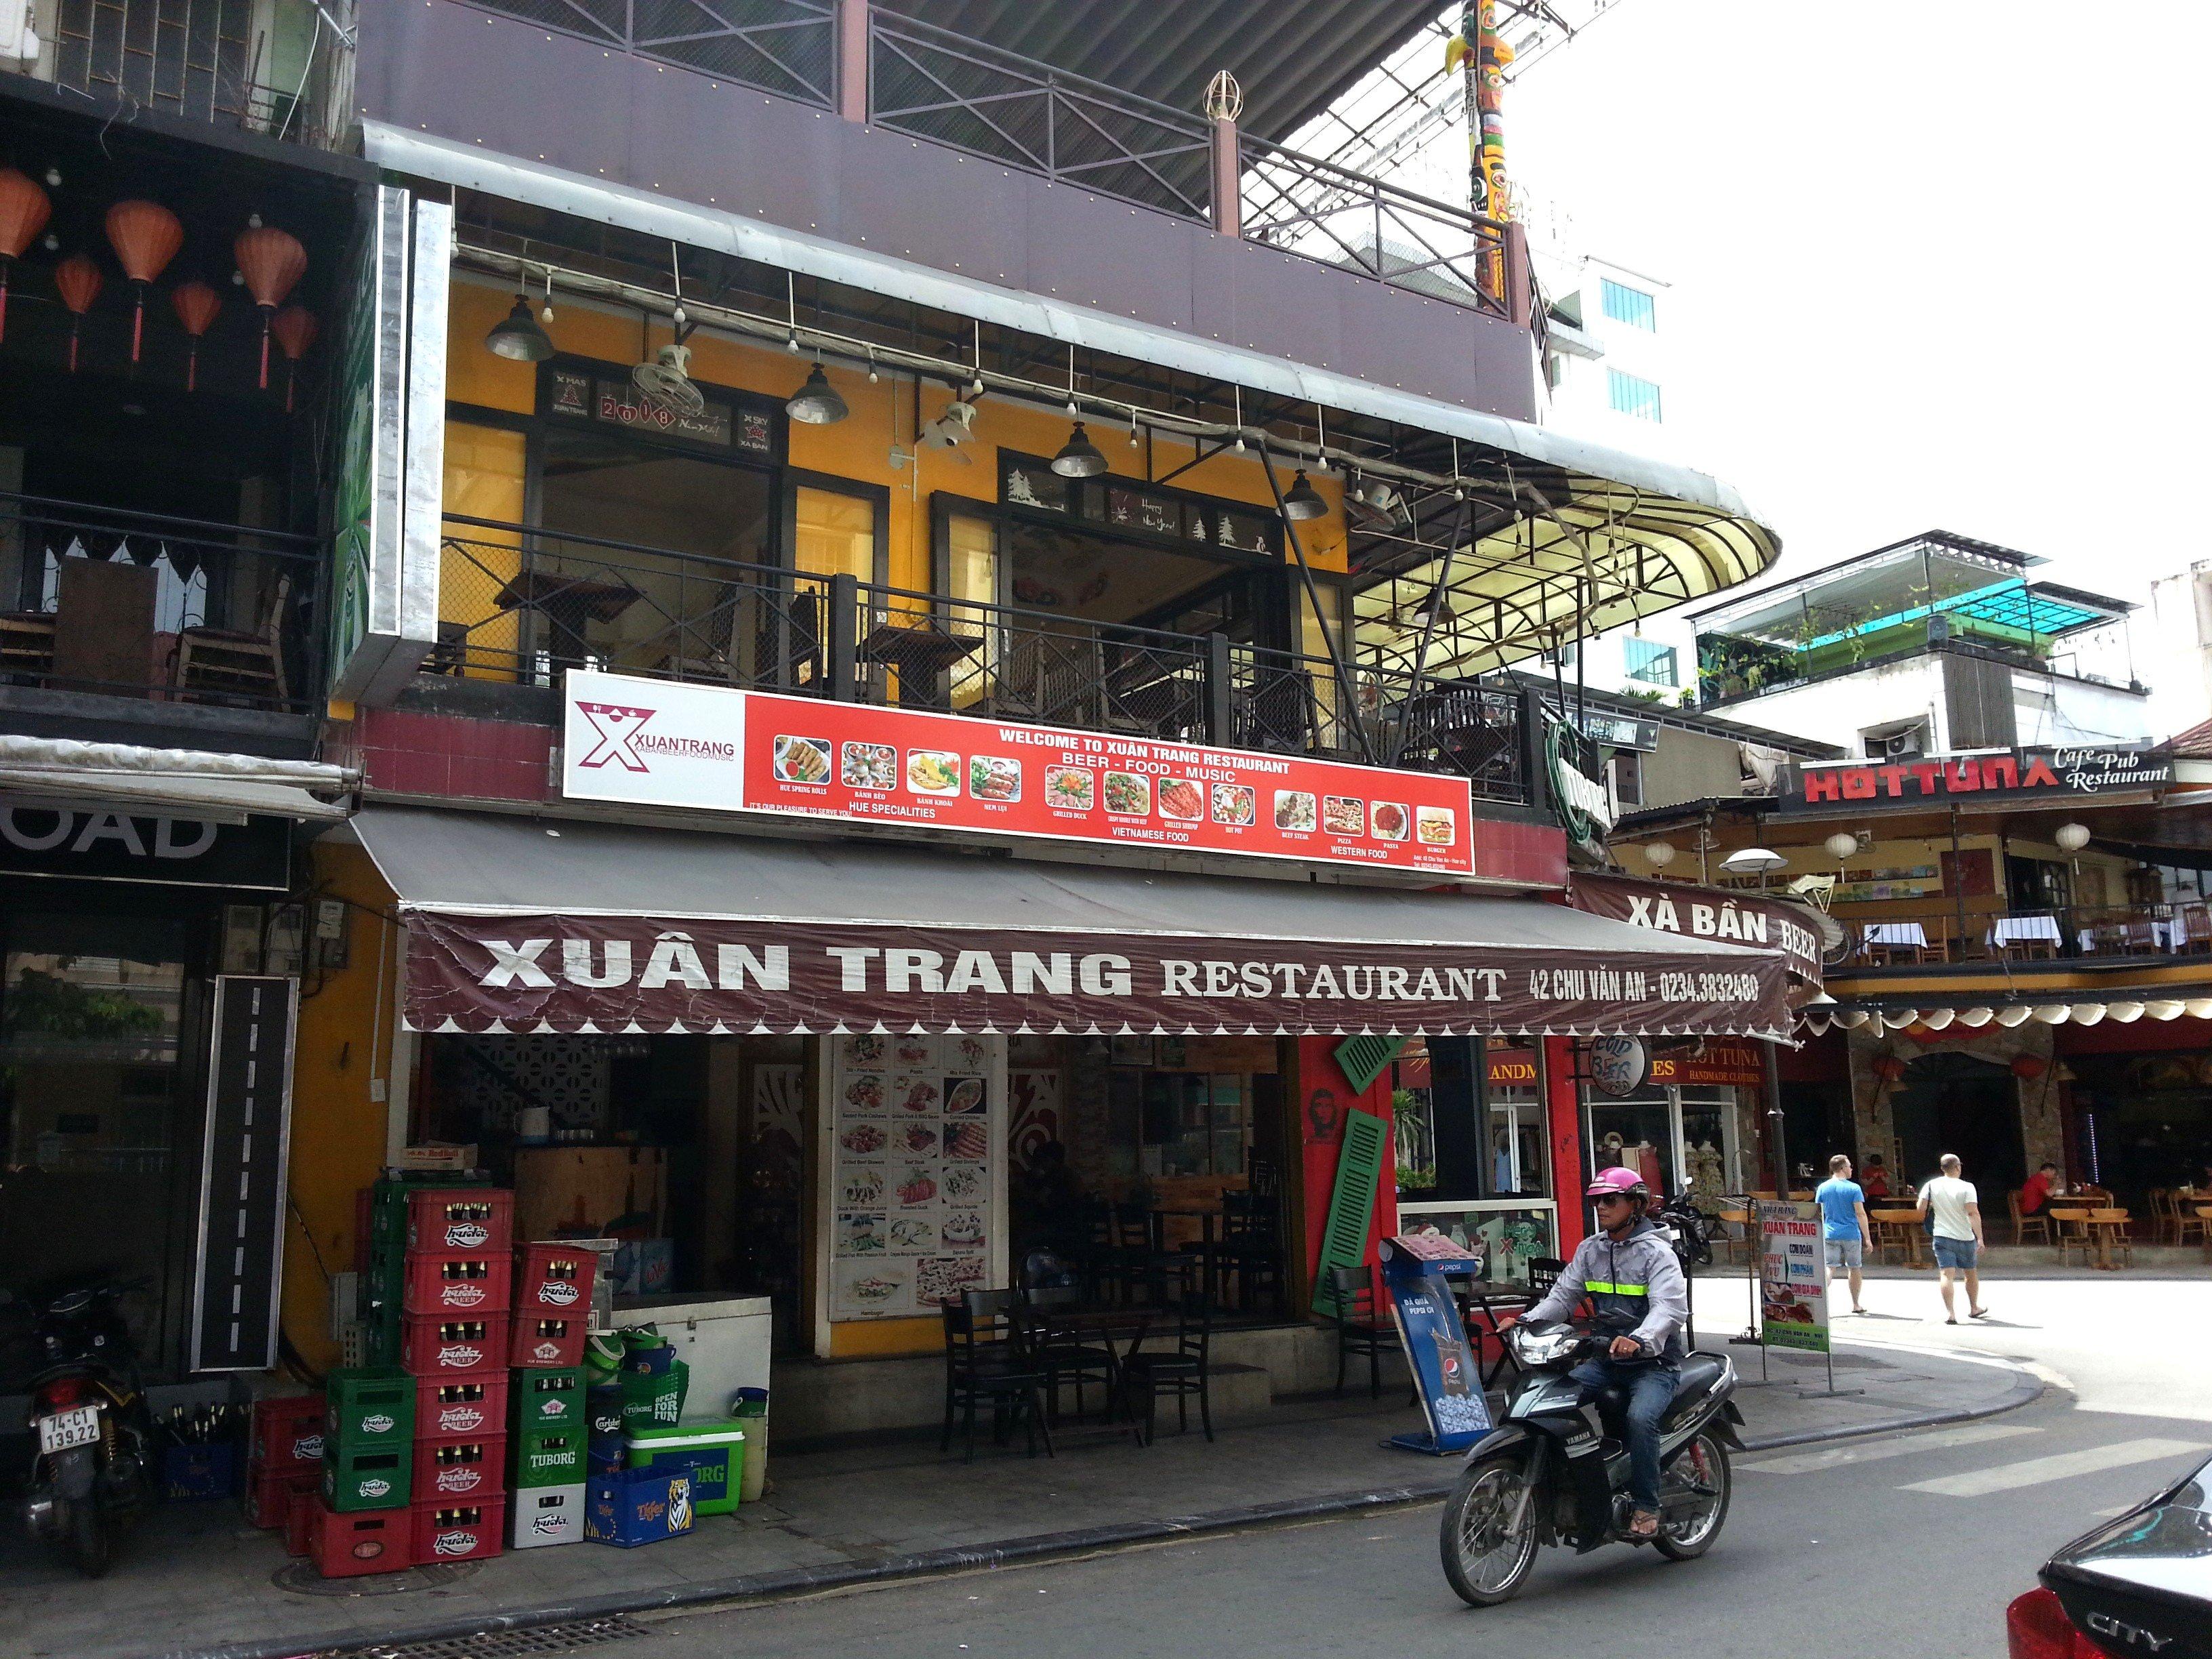 Front of Xuan Trang Restaurant